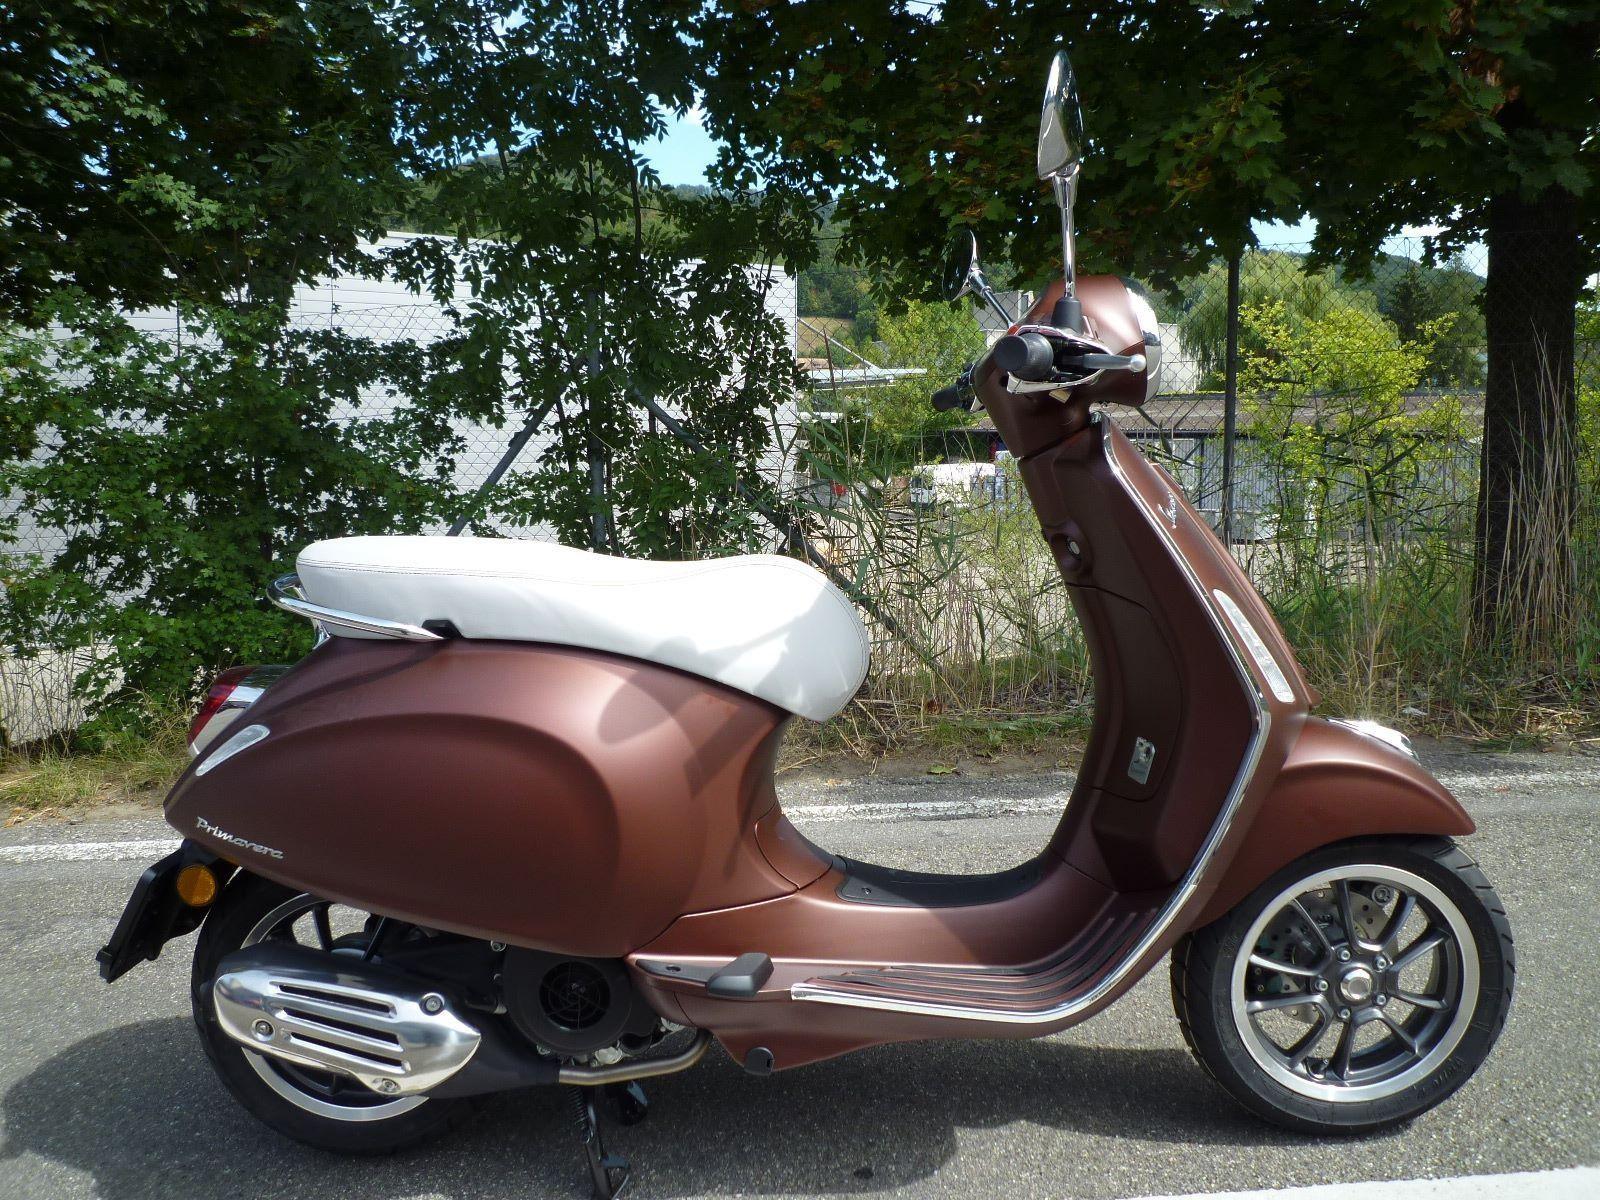 buy motorbike new vehicle bike piaggio vespa primavera 125 i e 3v 50 jahre version gr tter. Black Bedroom Furniture Sets. Home Design Ideas